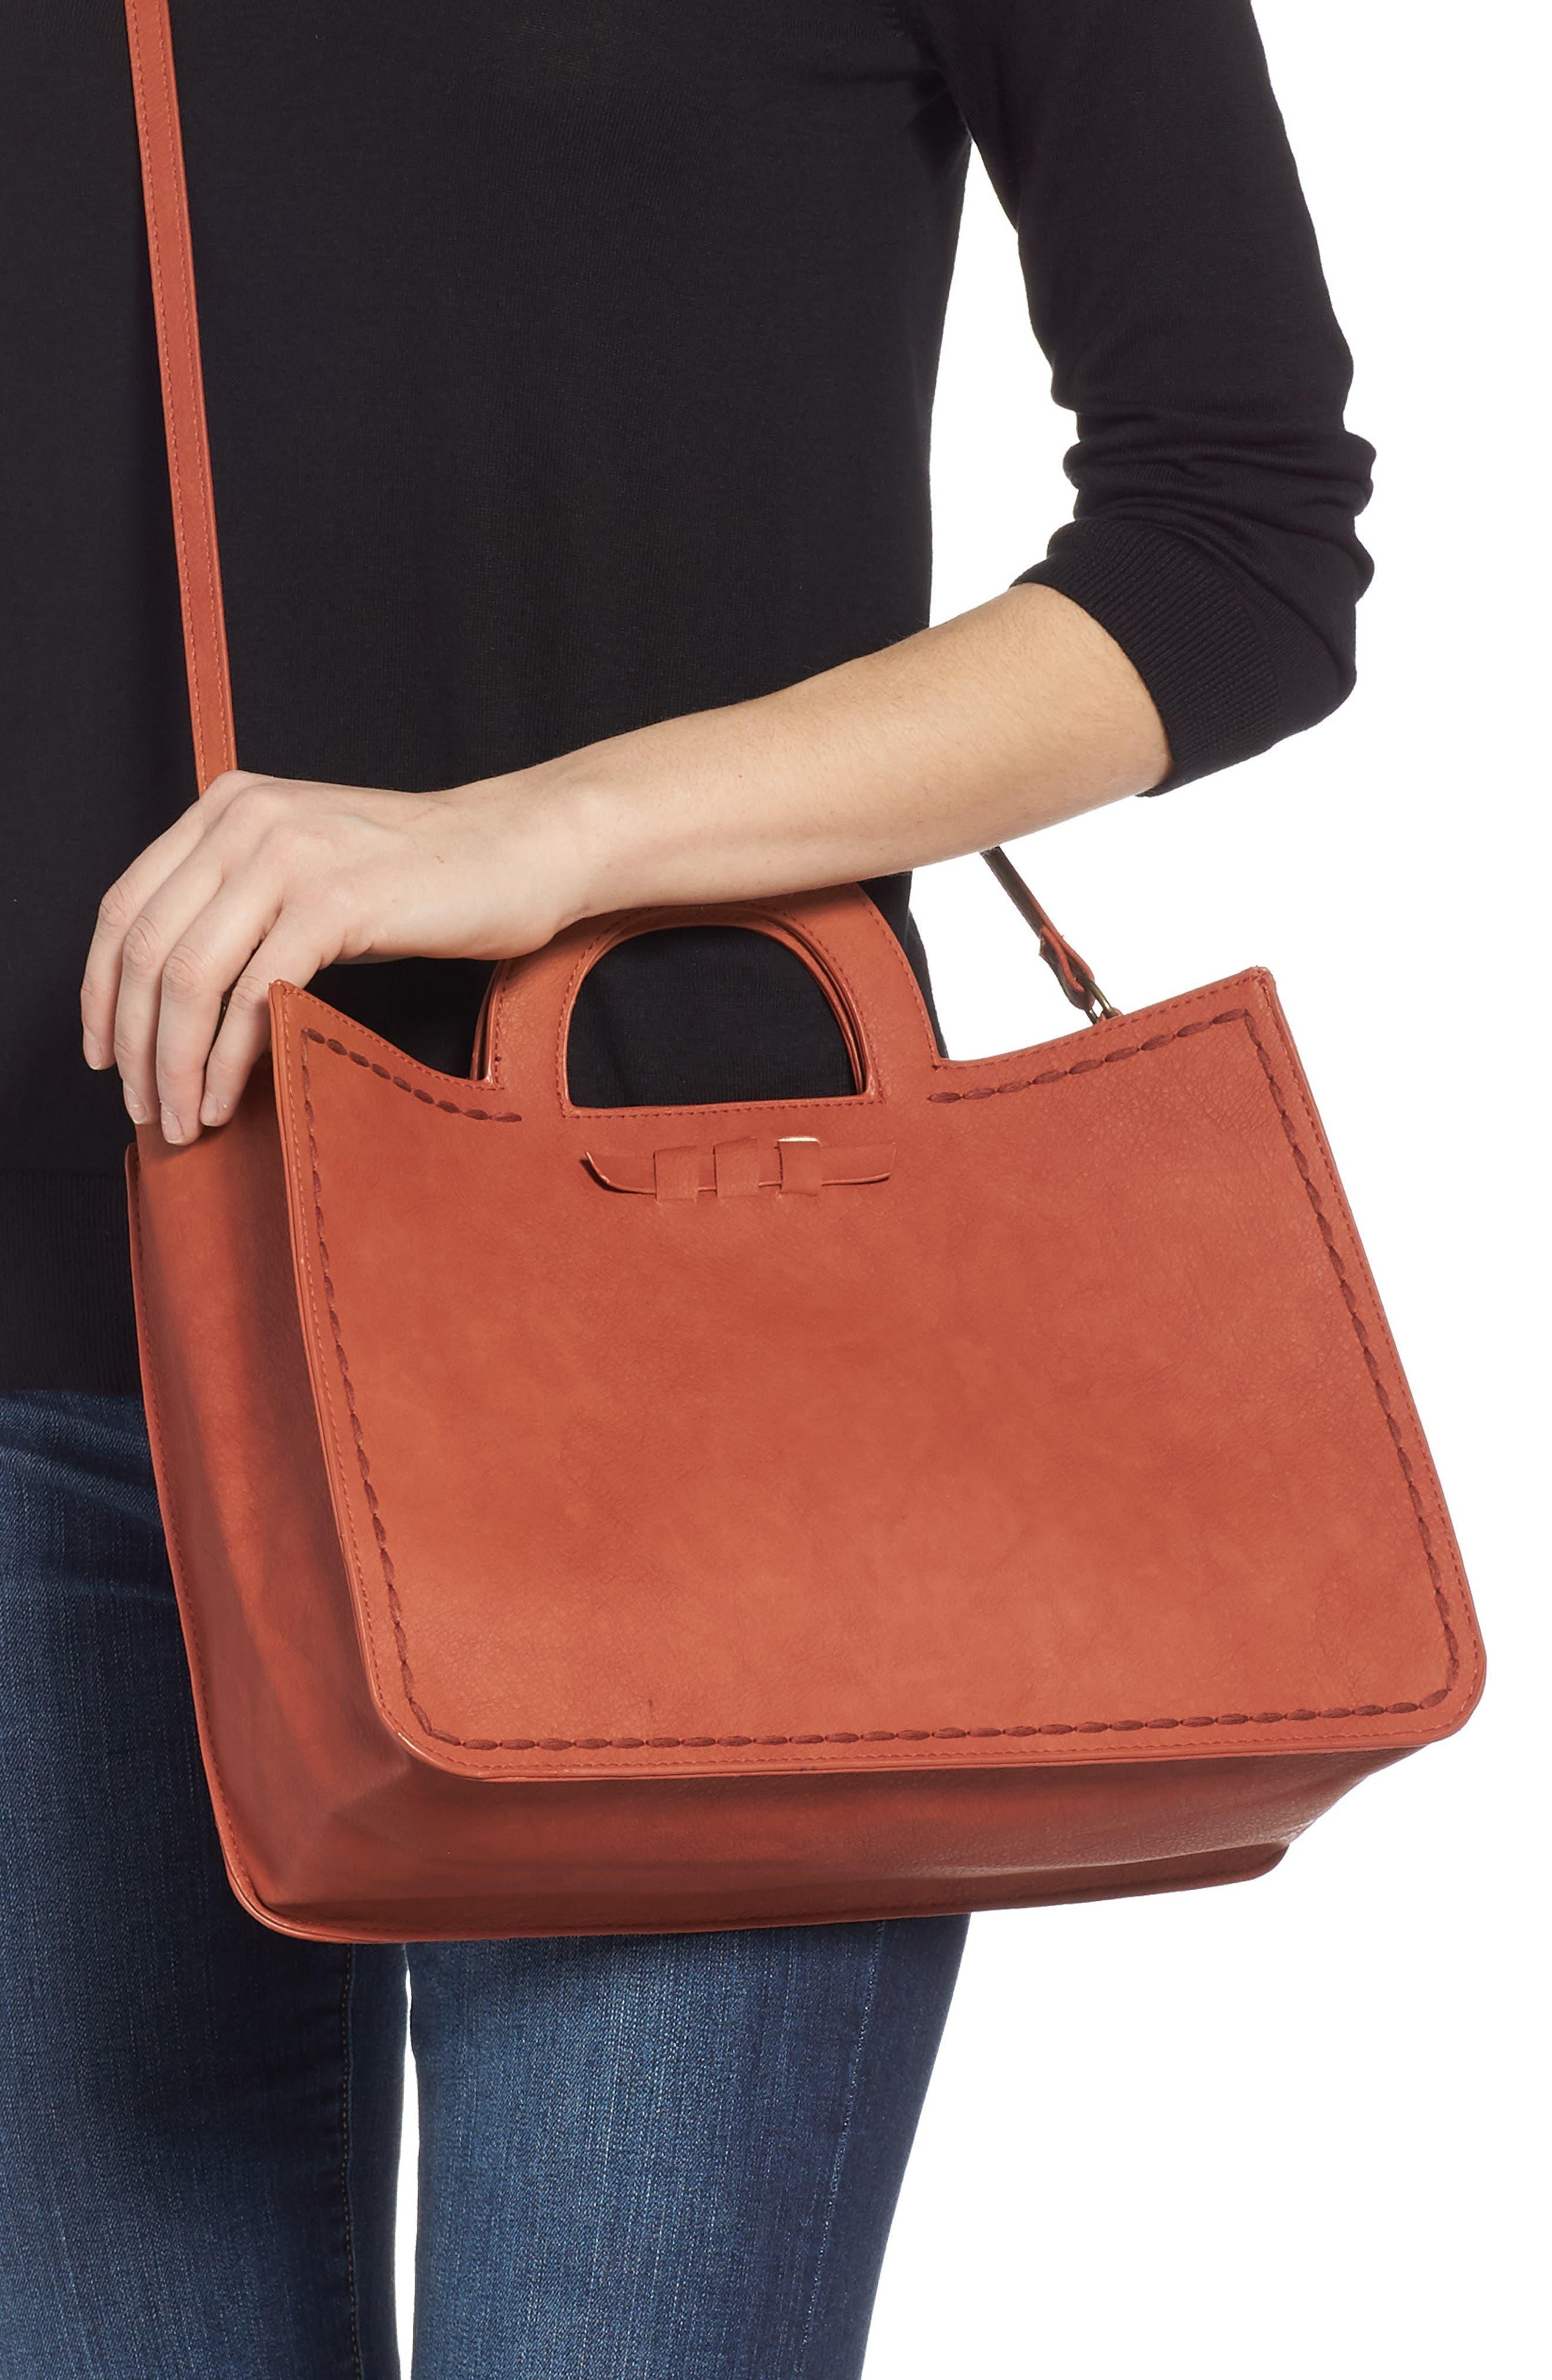 T-SHIRT & JEANS, Faux Leather Top Handle Tote Bag, Alternate thumbnail 2, color, 805